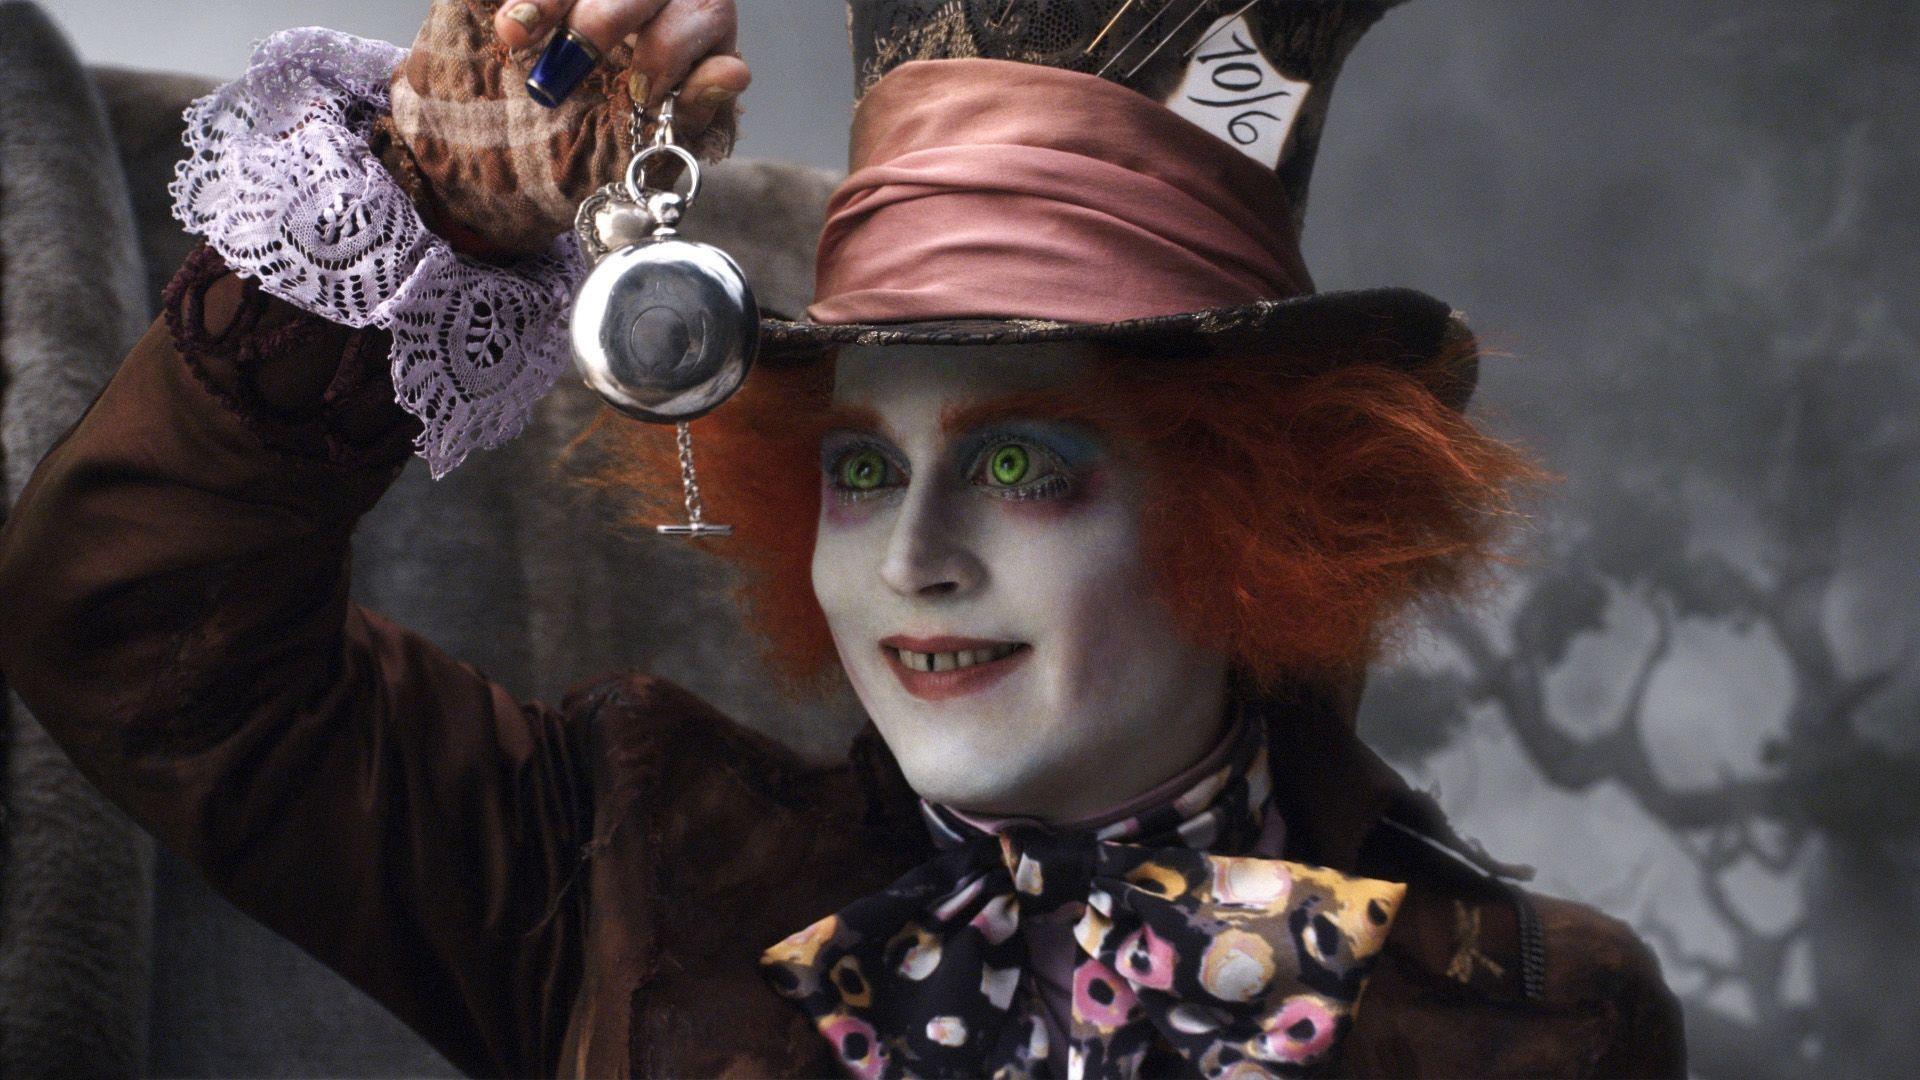 Mad Hatter Johnny Depp Photo Hatter Alice In Wonderland Costume Mad Hatter Costumes Tim Burton Mad Hatter